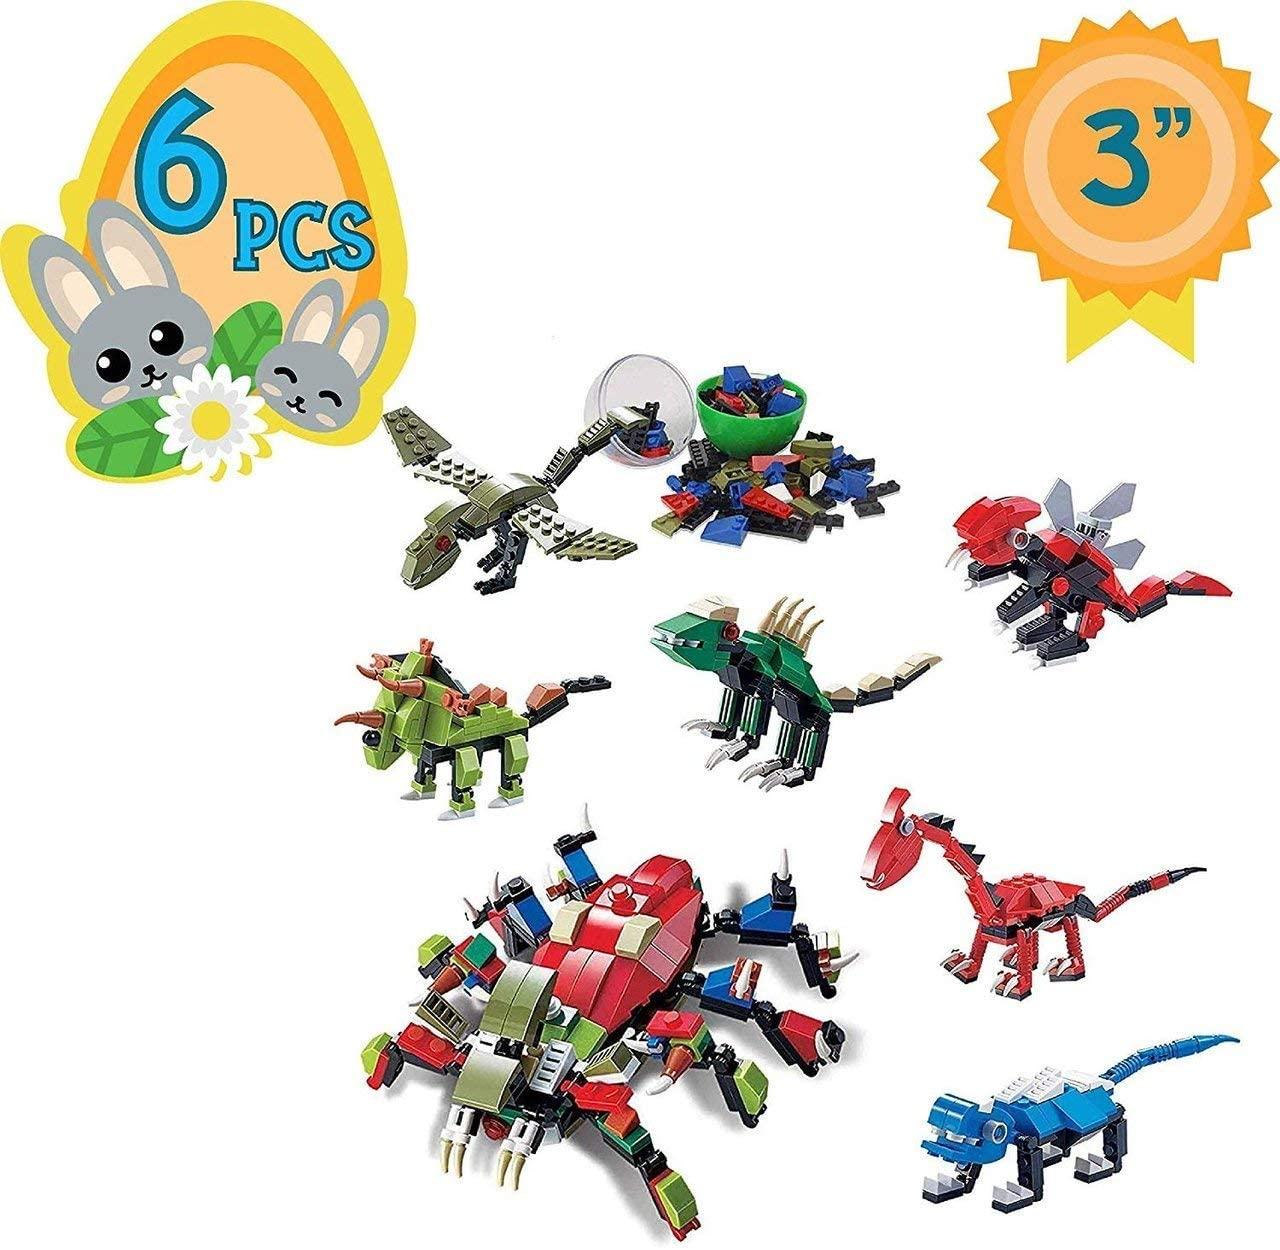 Totem World 6 Filled Easter Egg Building Toys - Dinosaur Set - Age 6-12 Learning Educational Inside 3